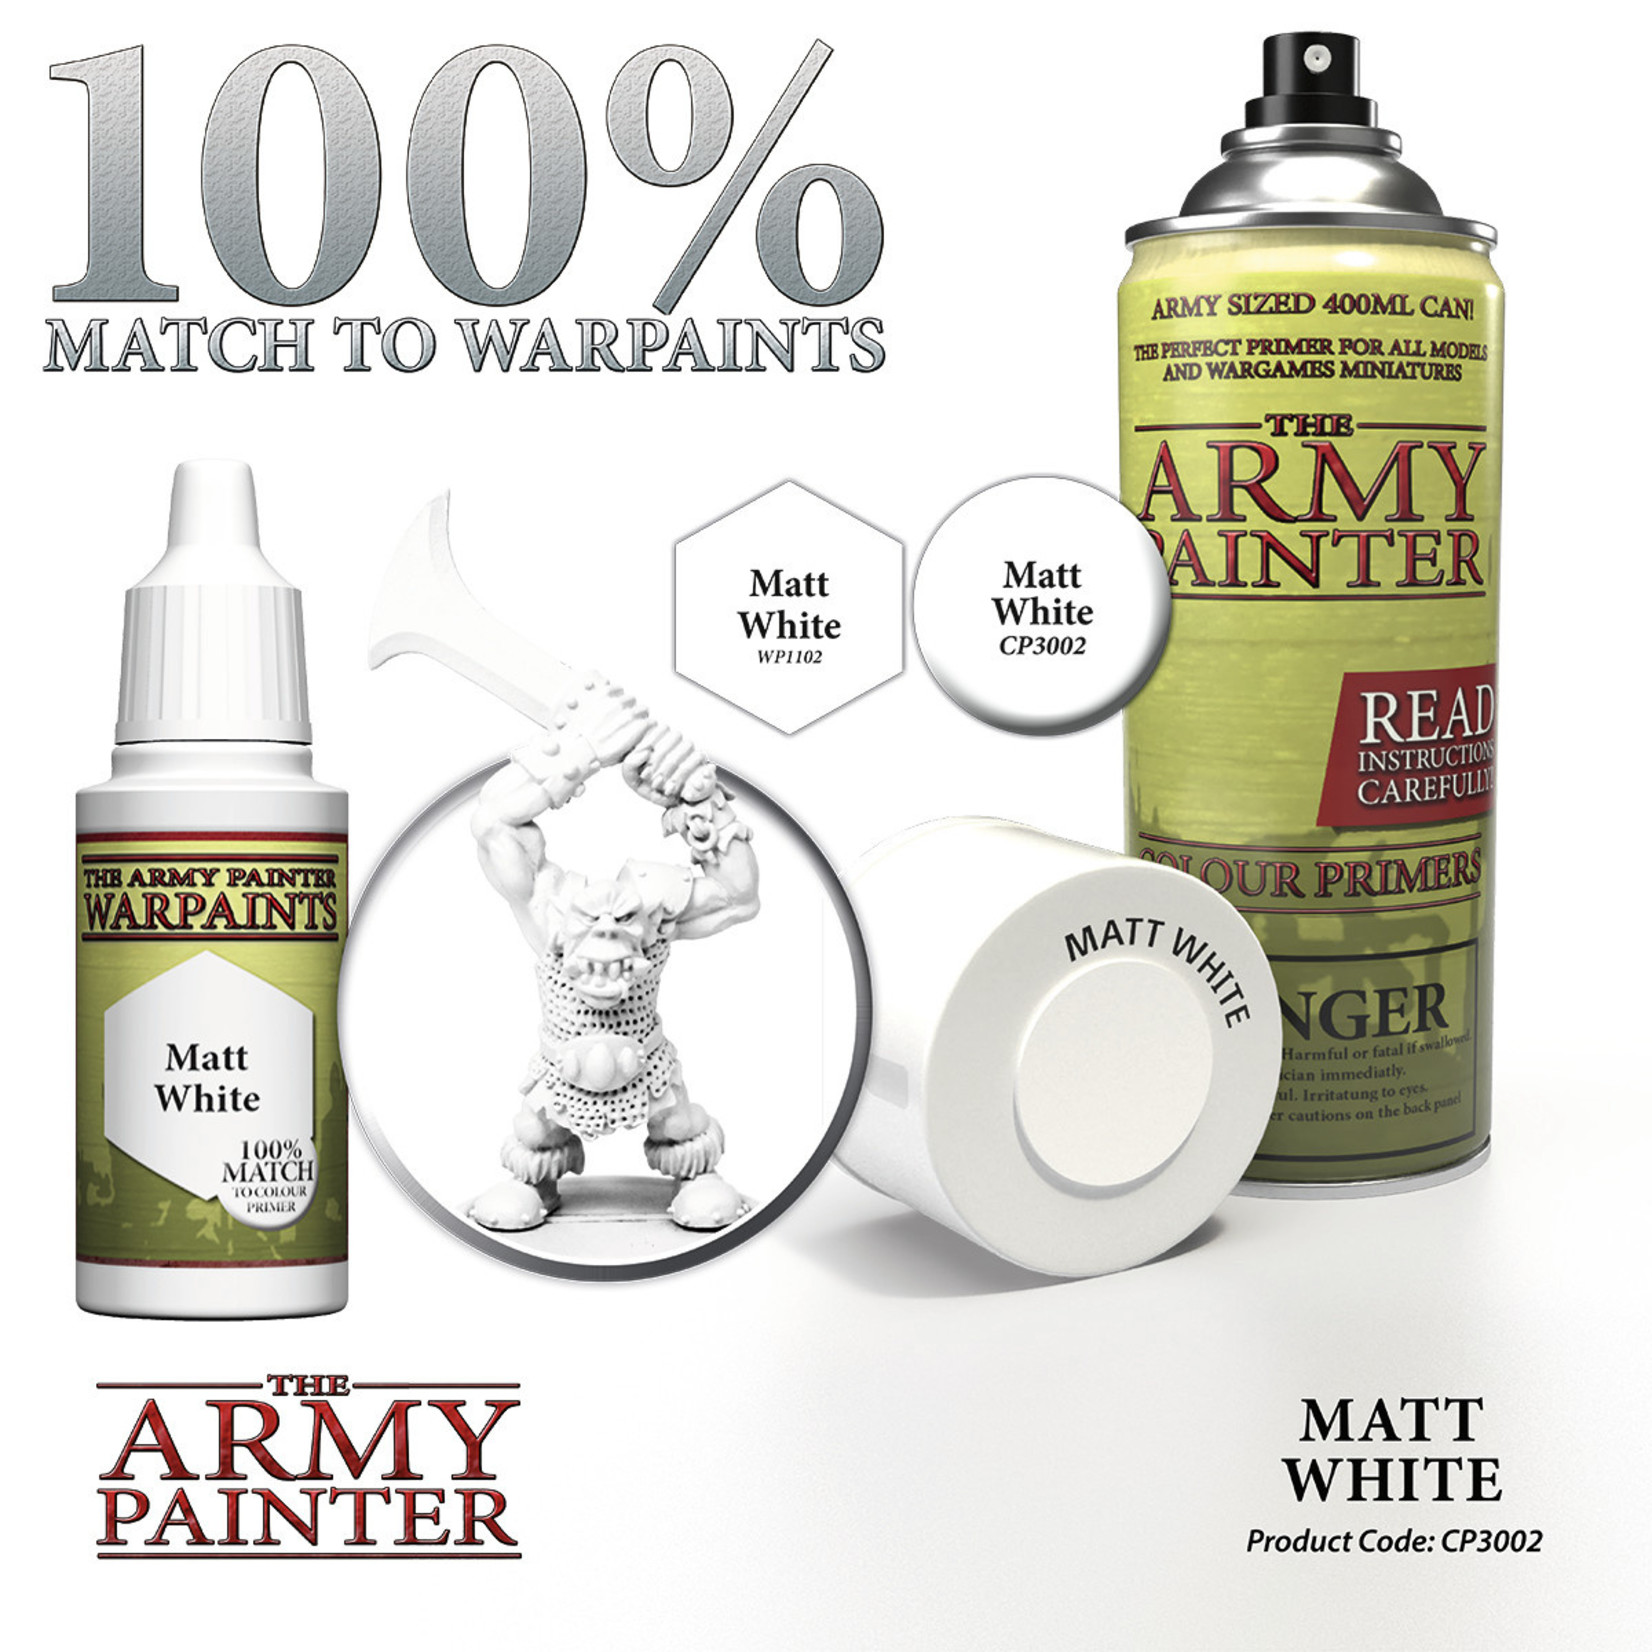 The Army Painter Color Primer Matte White